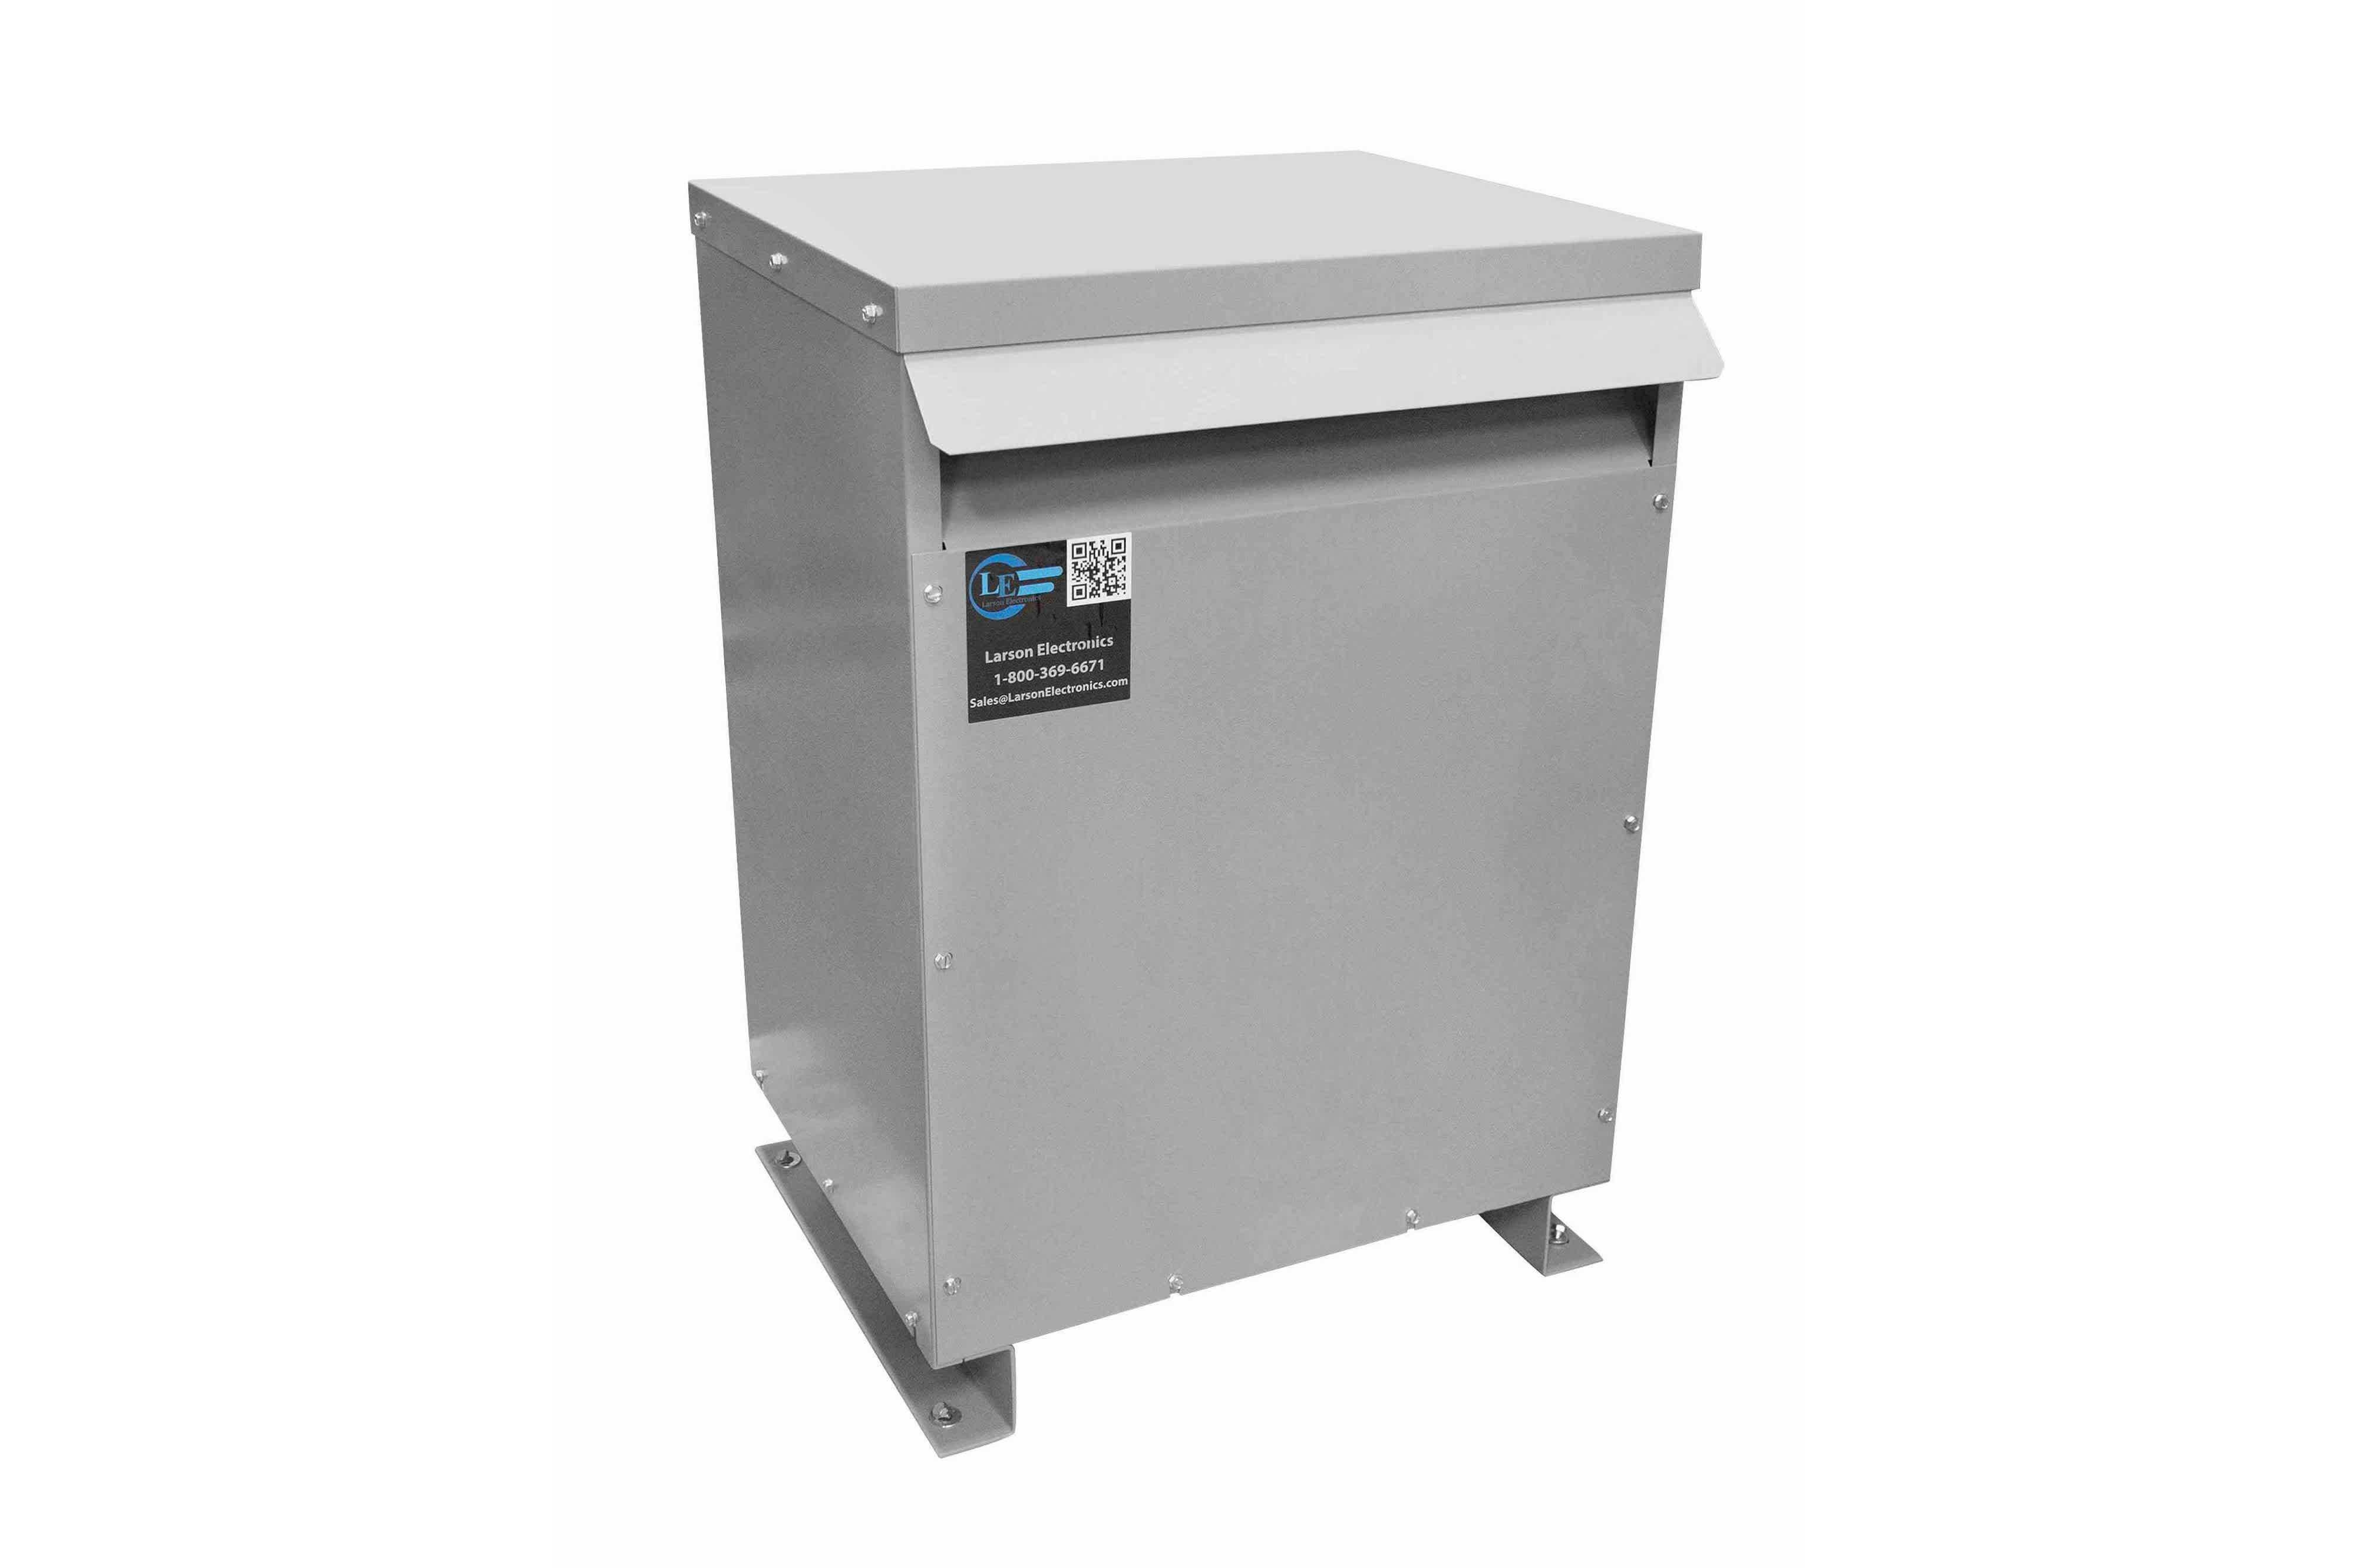 30 kVA 3PH Isolation Transformer, 380V Wye Primary, 600V Delta Secondary, N3R, Ventilated, 60 Hz